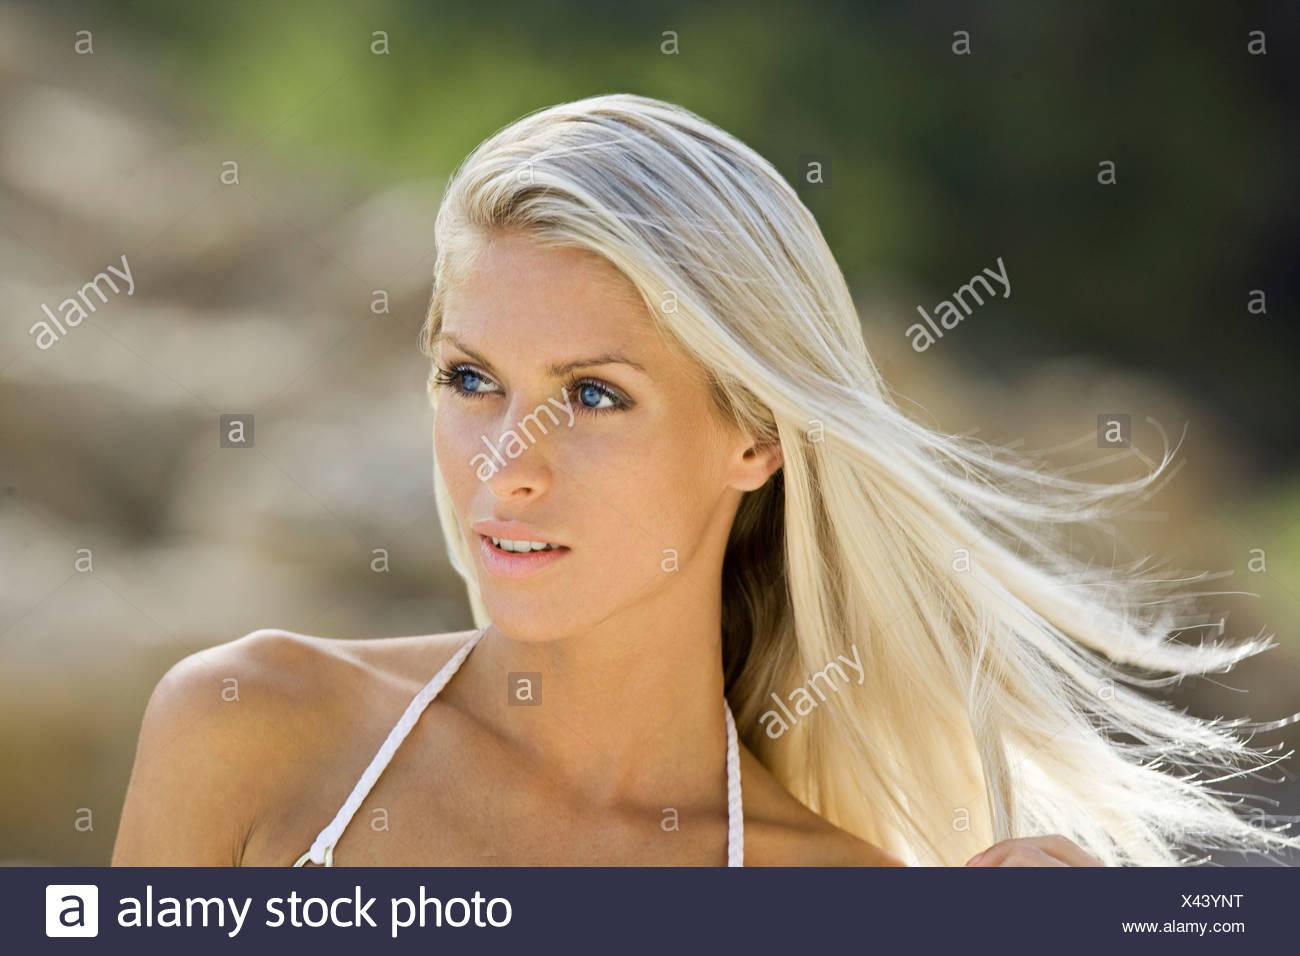 Head shot of beach girl blonde Photo Stock